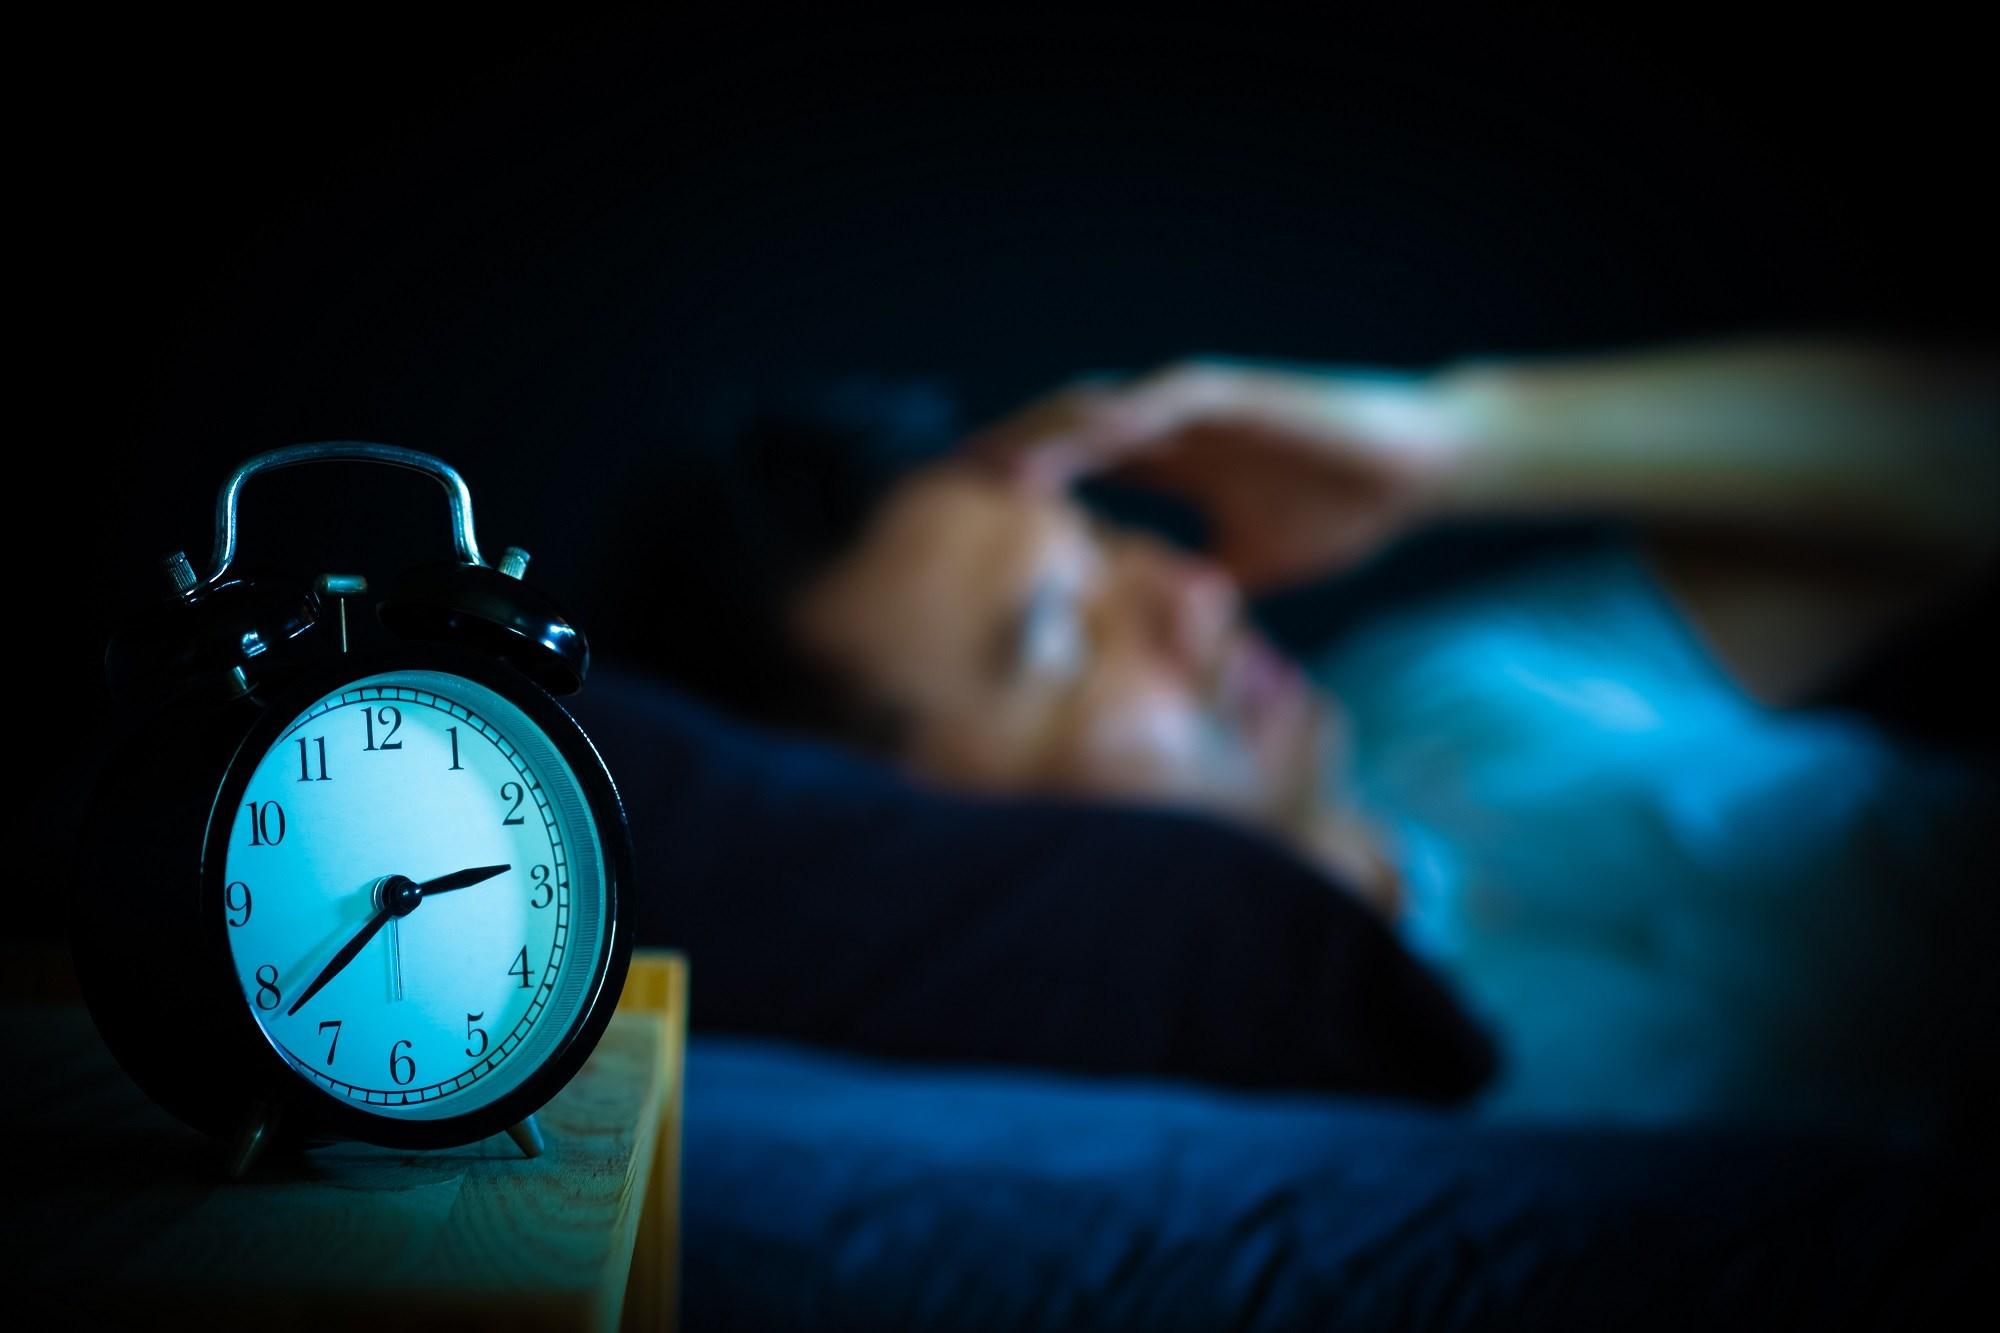 Link Between Sleep Disturbances and Inflammatory Markers in Schizophrenia